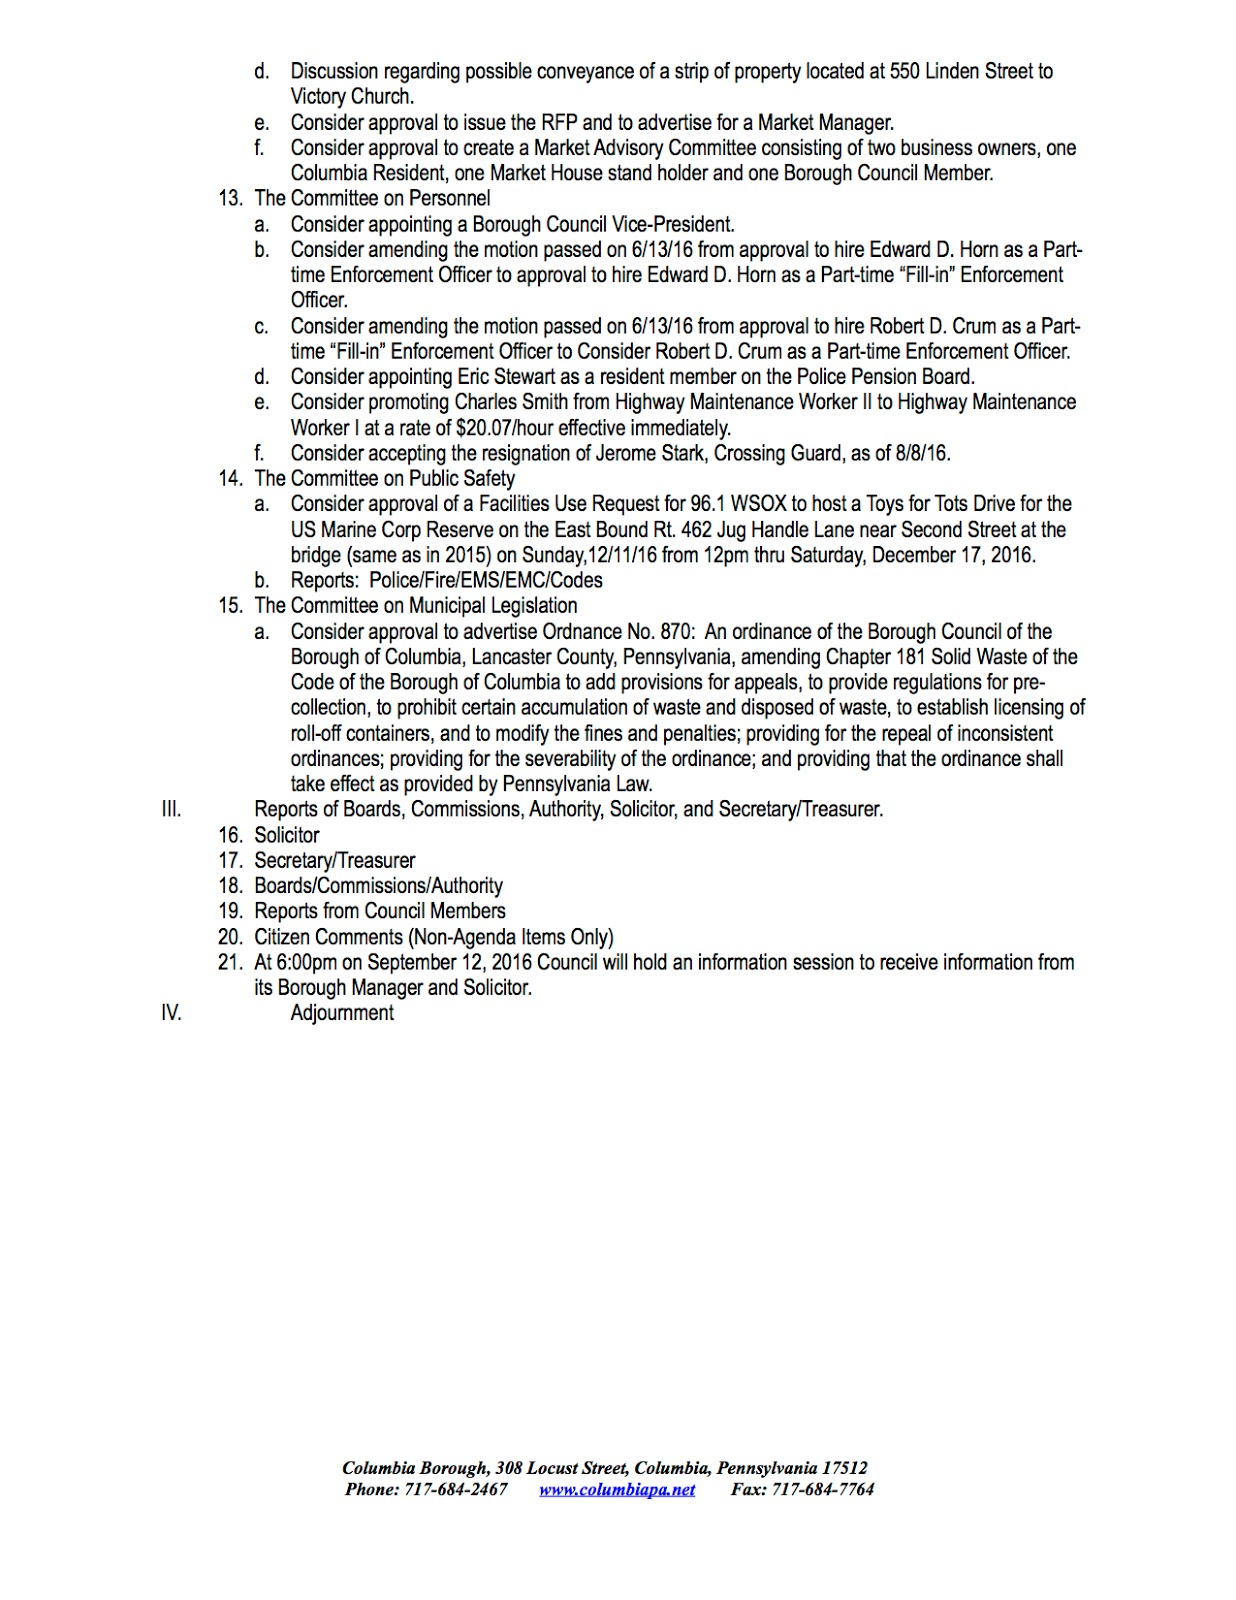 COLUMBIA SPY Draft Agenda for August 8 2016 Columbia Borough – Draft Meeting Agenda